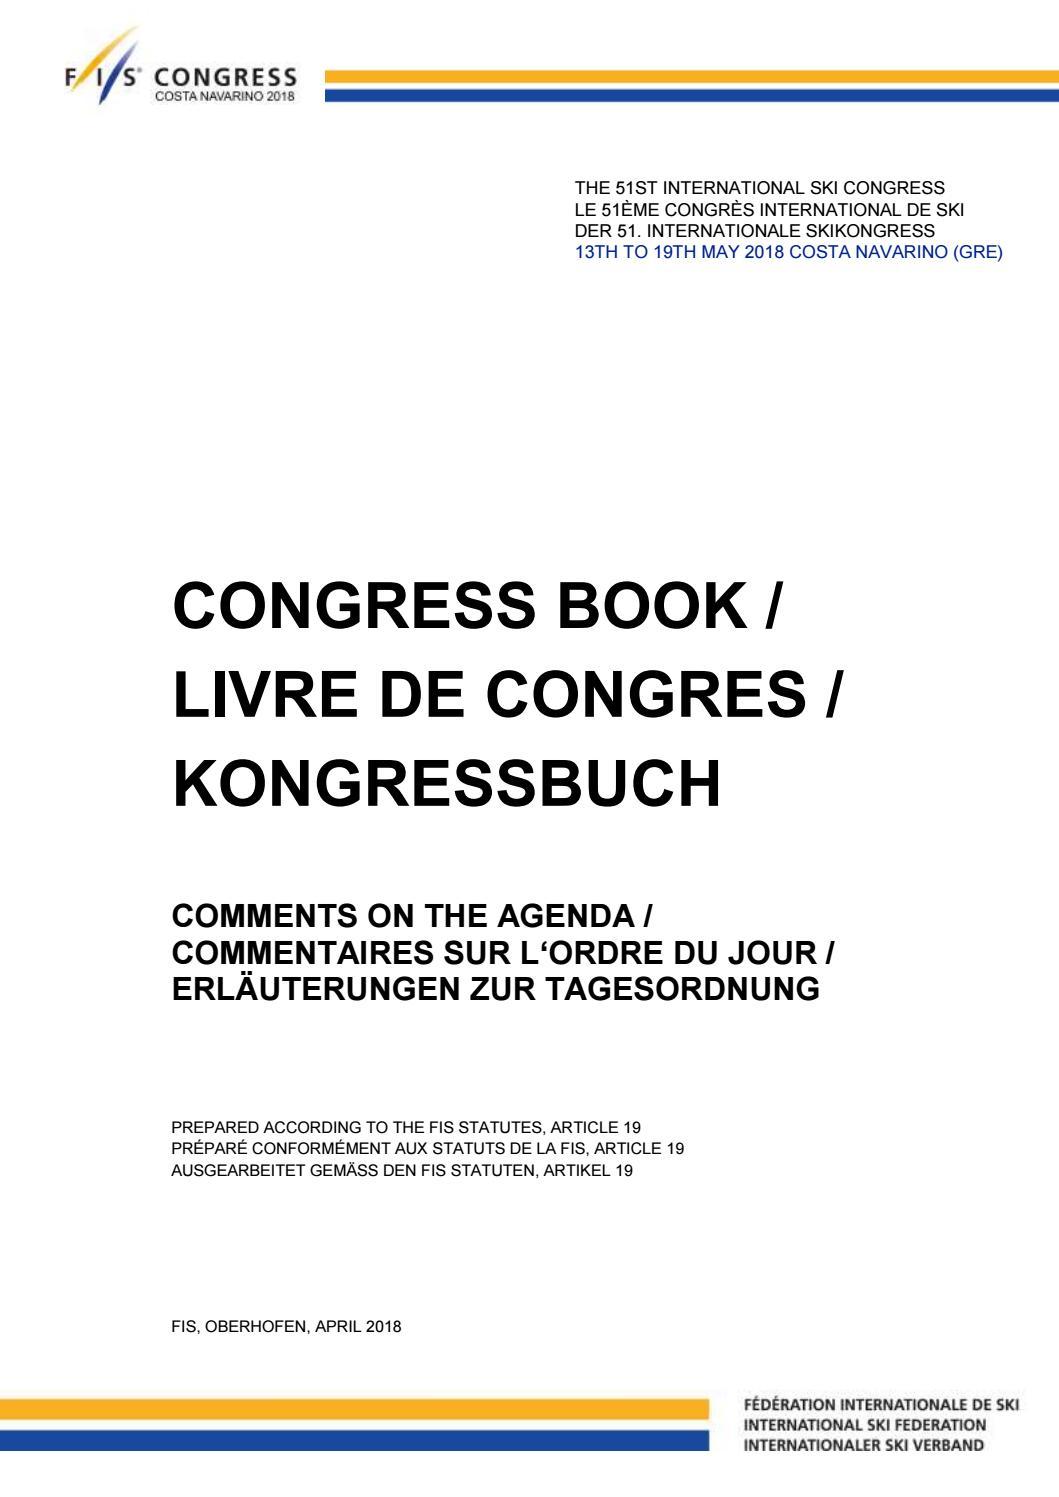 51st FIS Congress, Costa Navarino - Congress Book by FIS - issuu